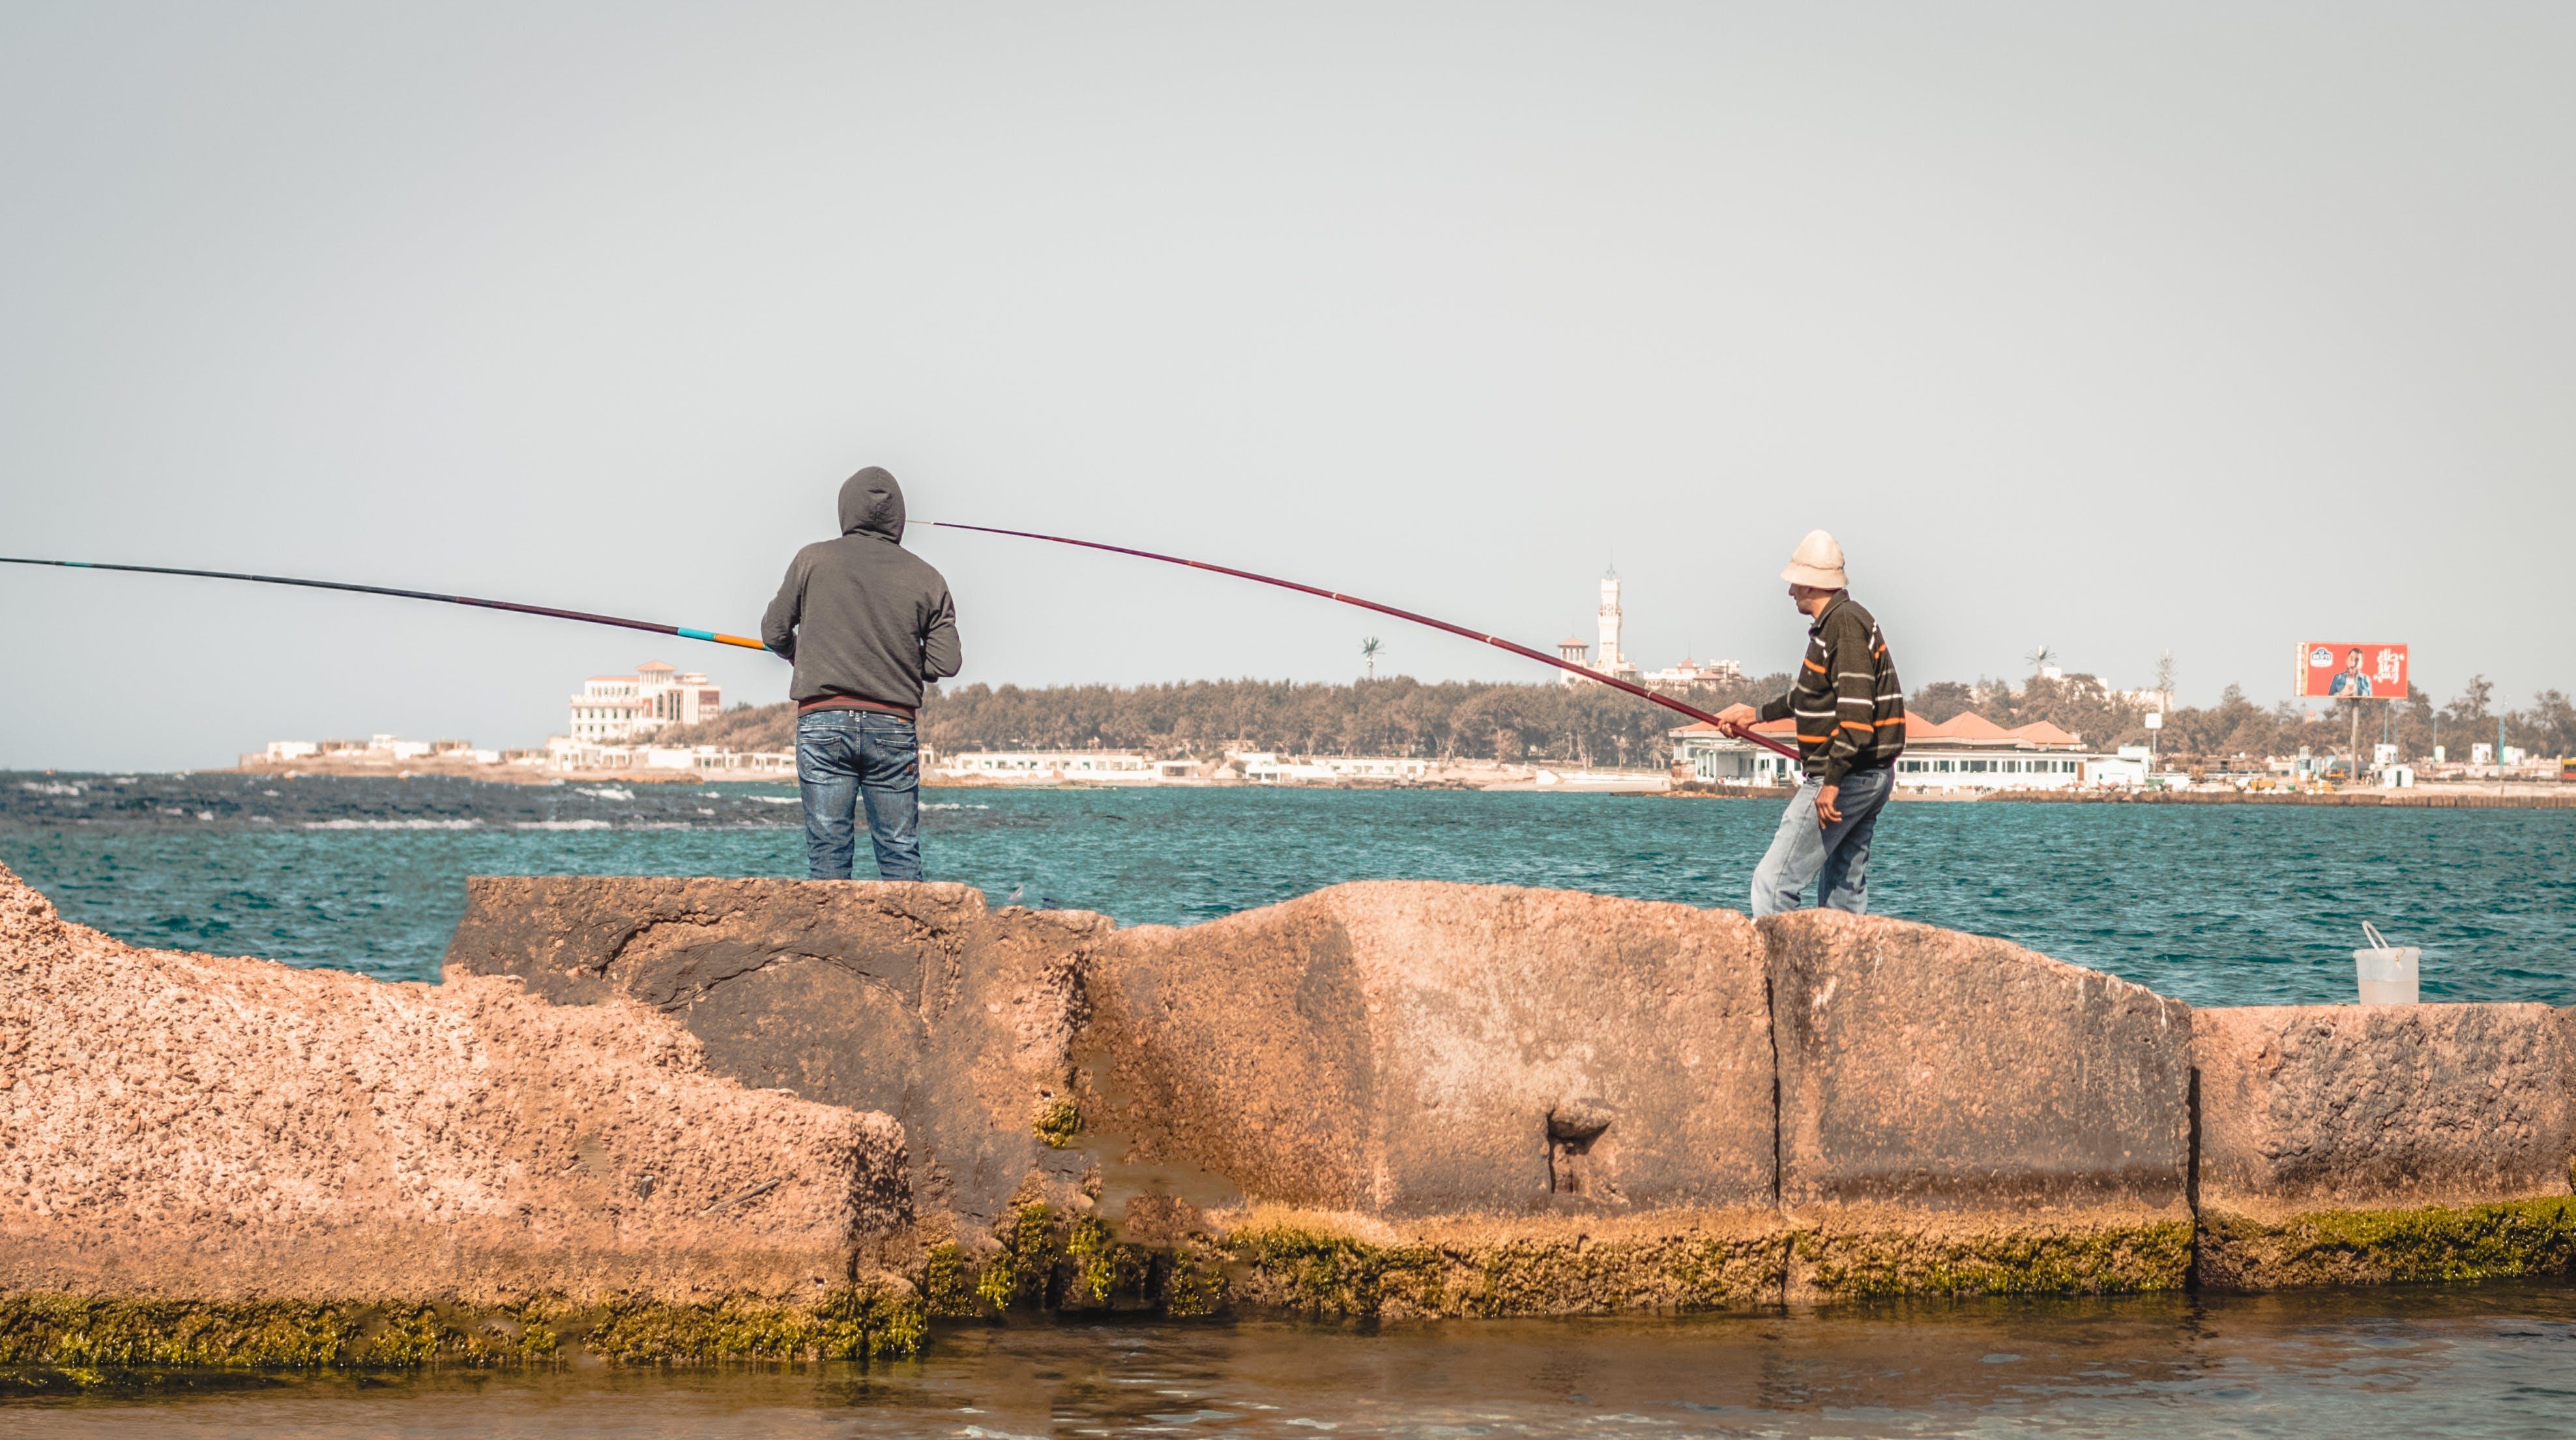 Free stock photo of #outdoorchallenge, action, beach, fisherman